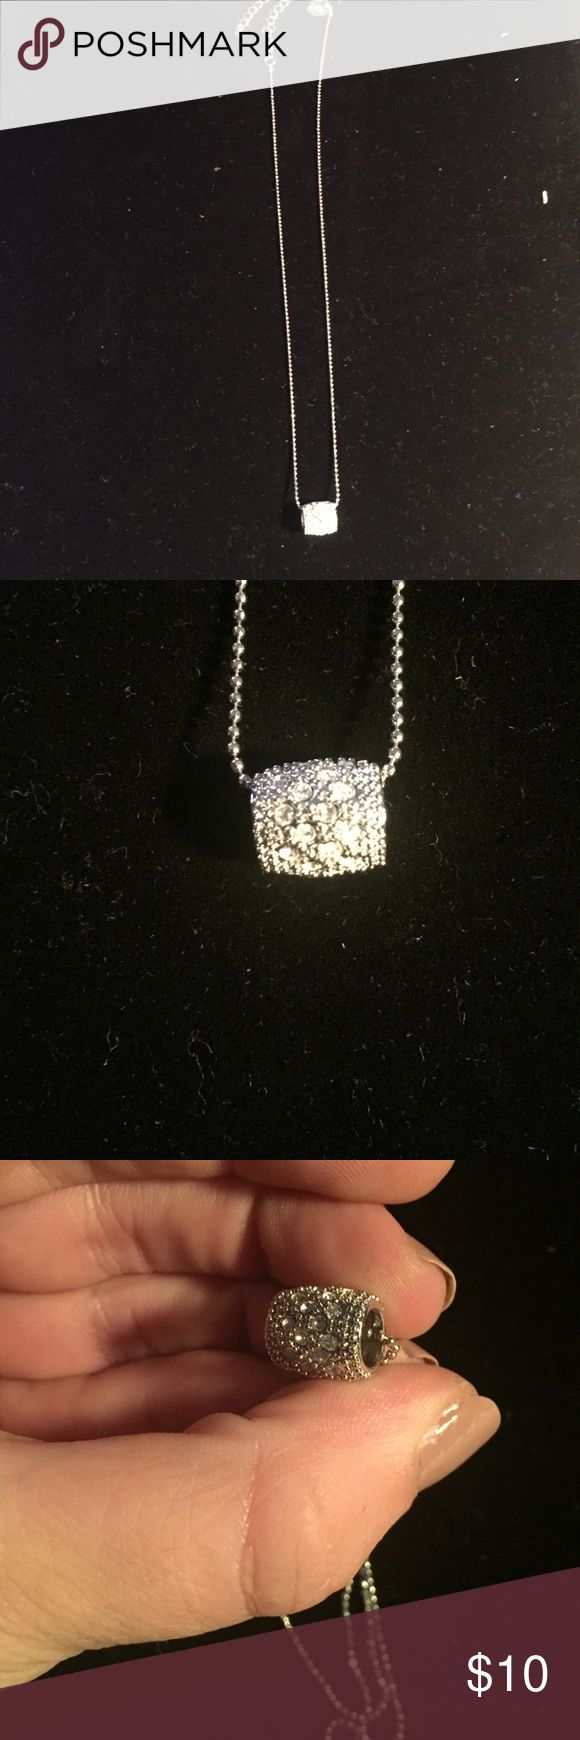 Lia Sophia Barrel Necklace Barrel faux diamond pendant. Adjustable between 16 and 19 inches in length. Lia Sophia Jewelry Necklaces